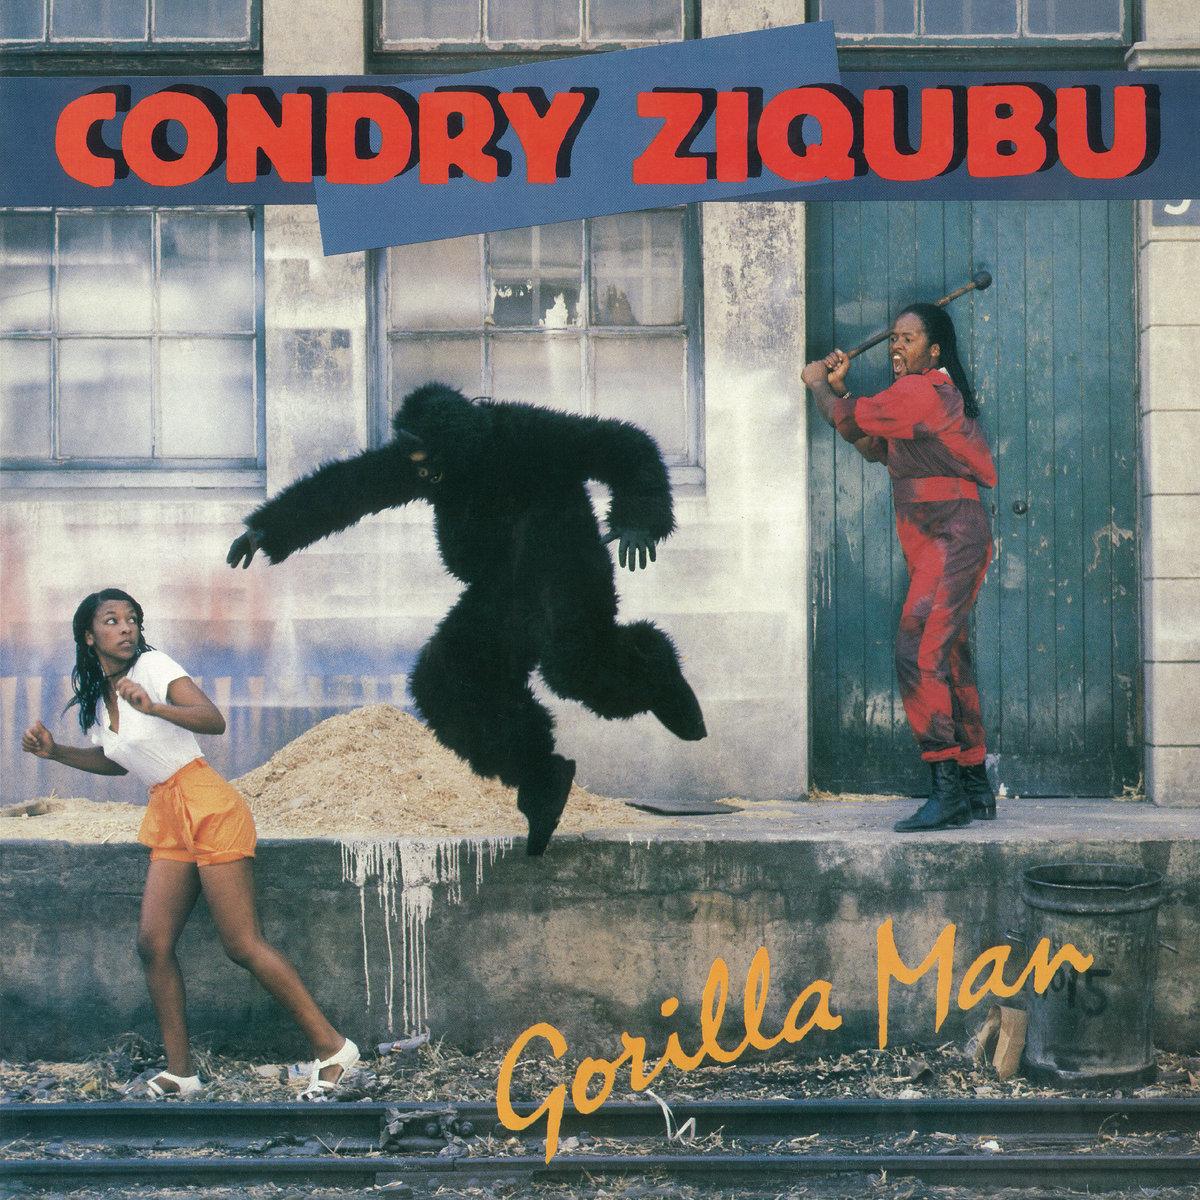 Condry Ziqubu Gorilla Man